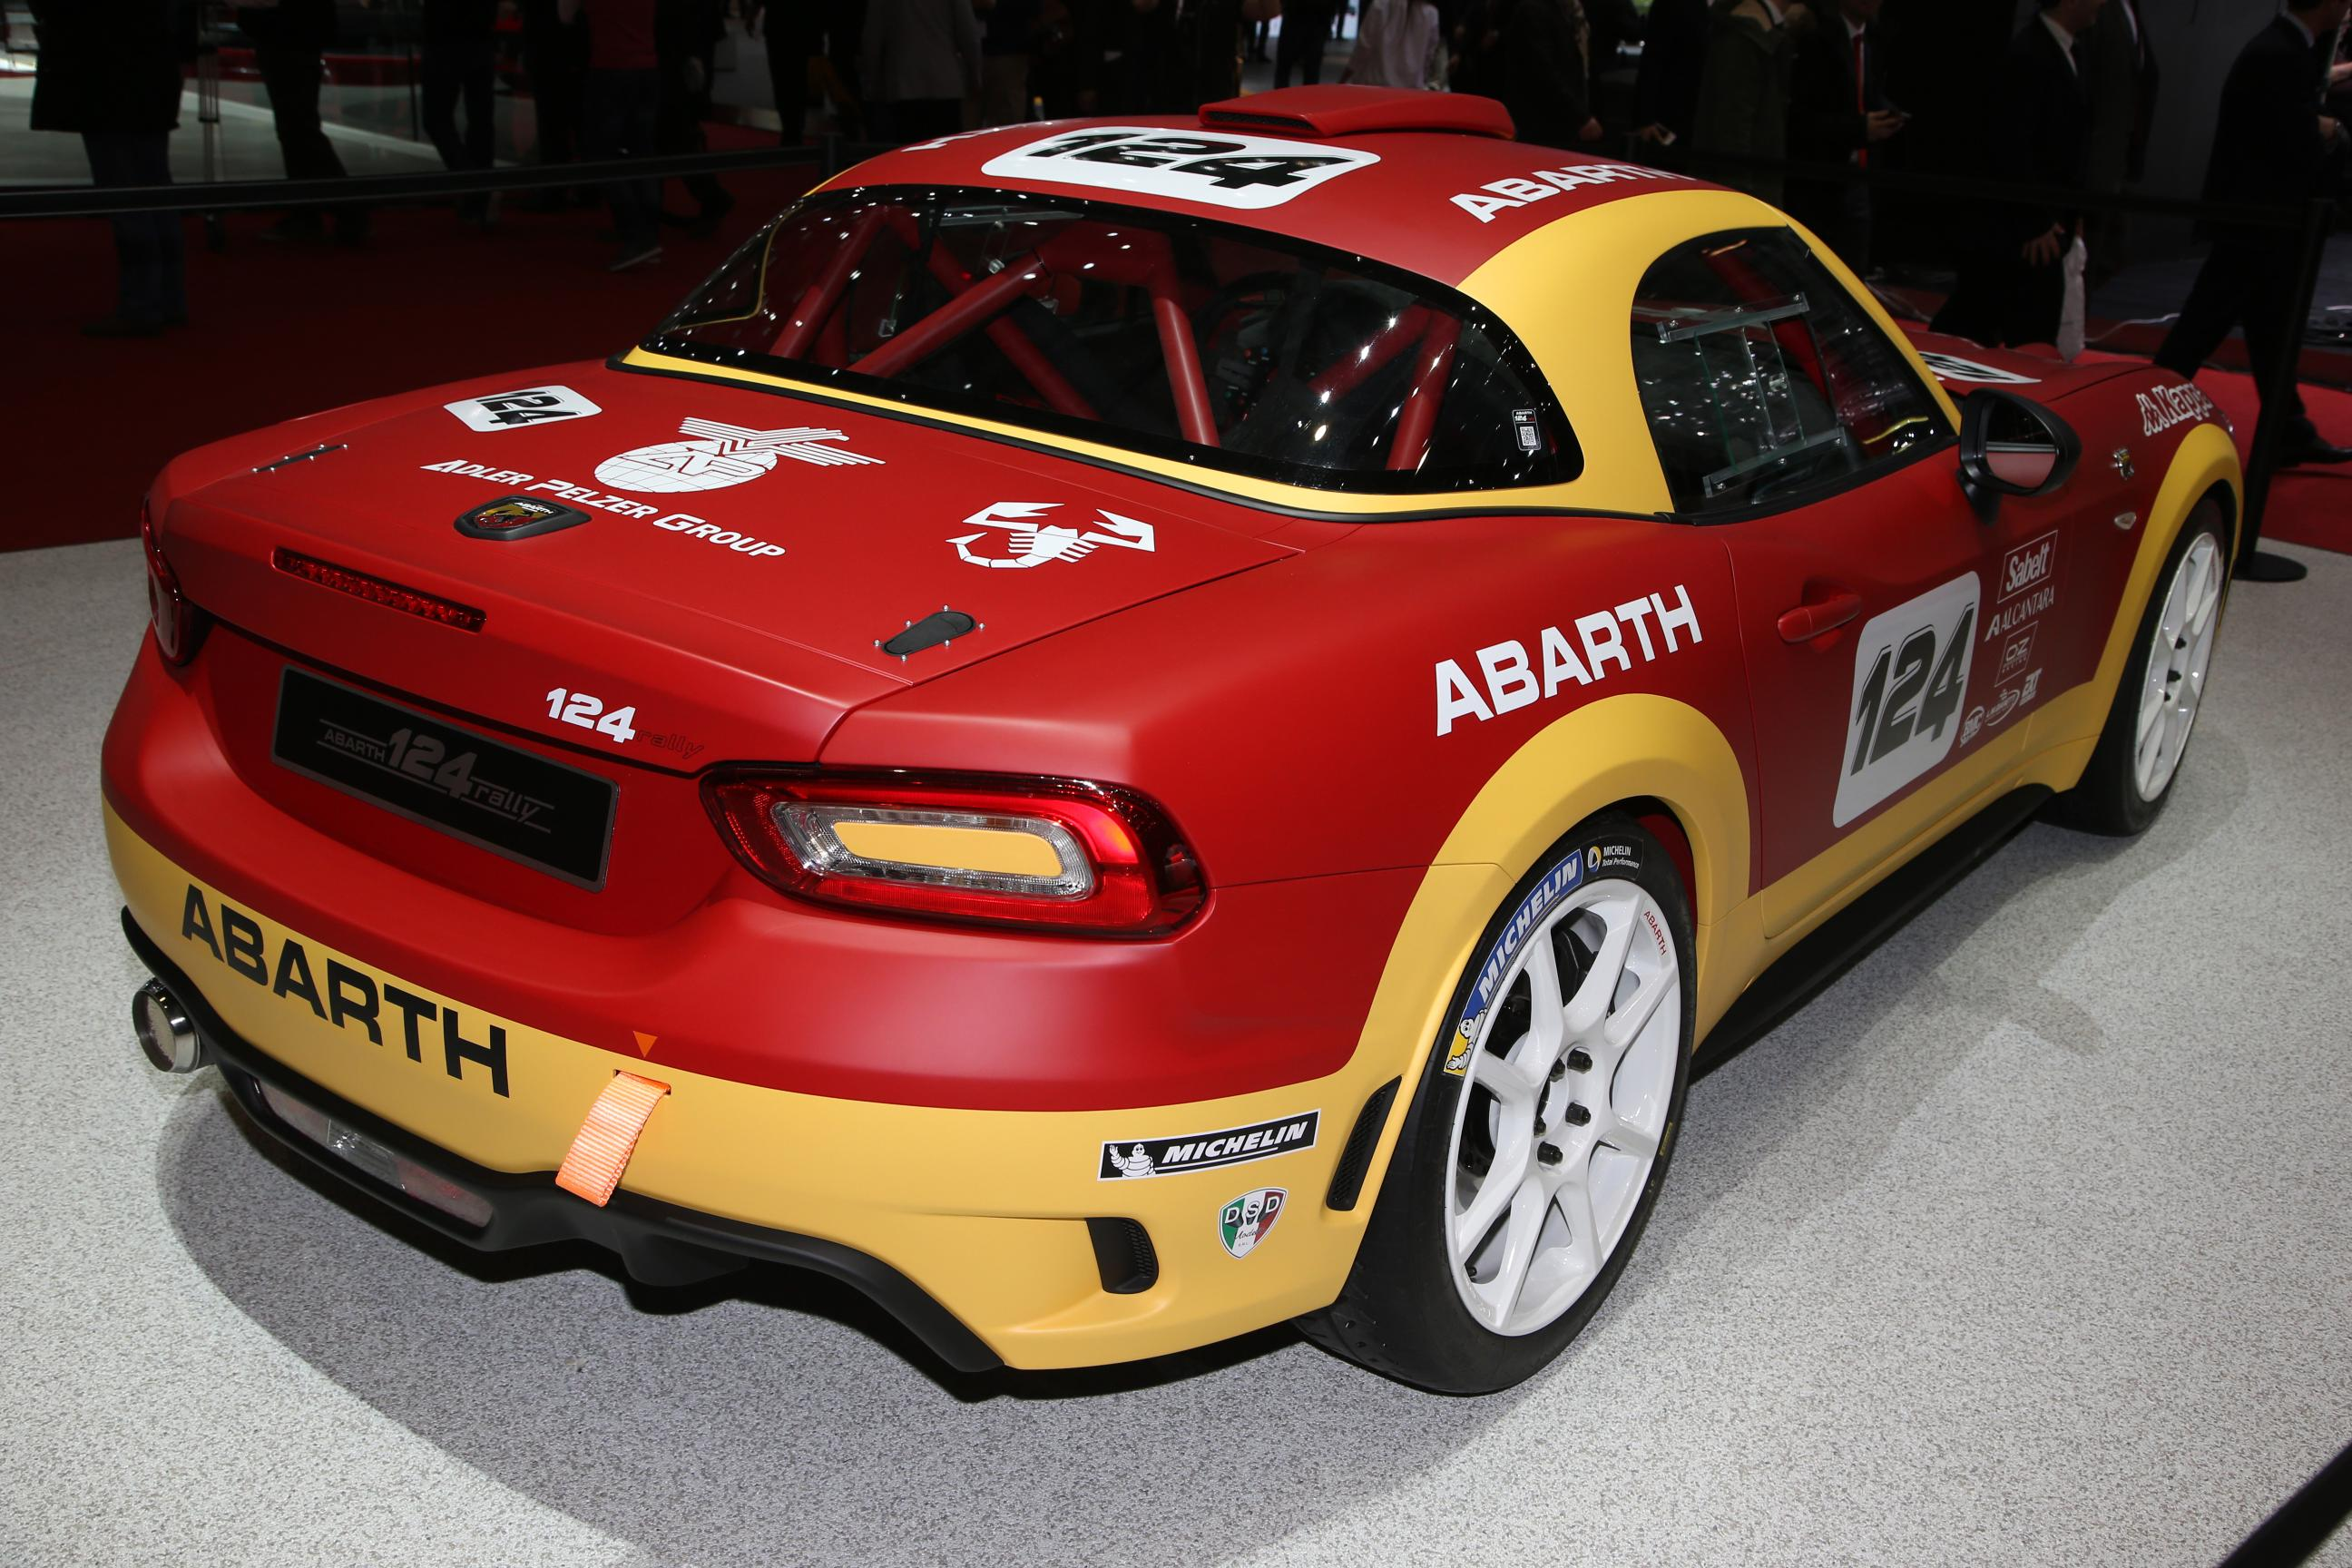 abarth 124 rally 1